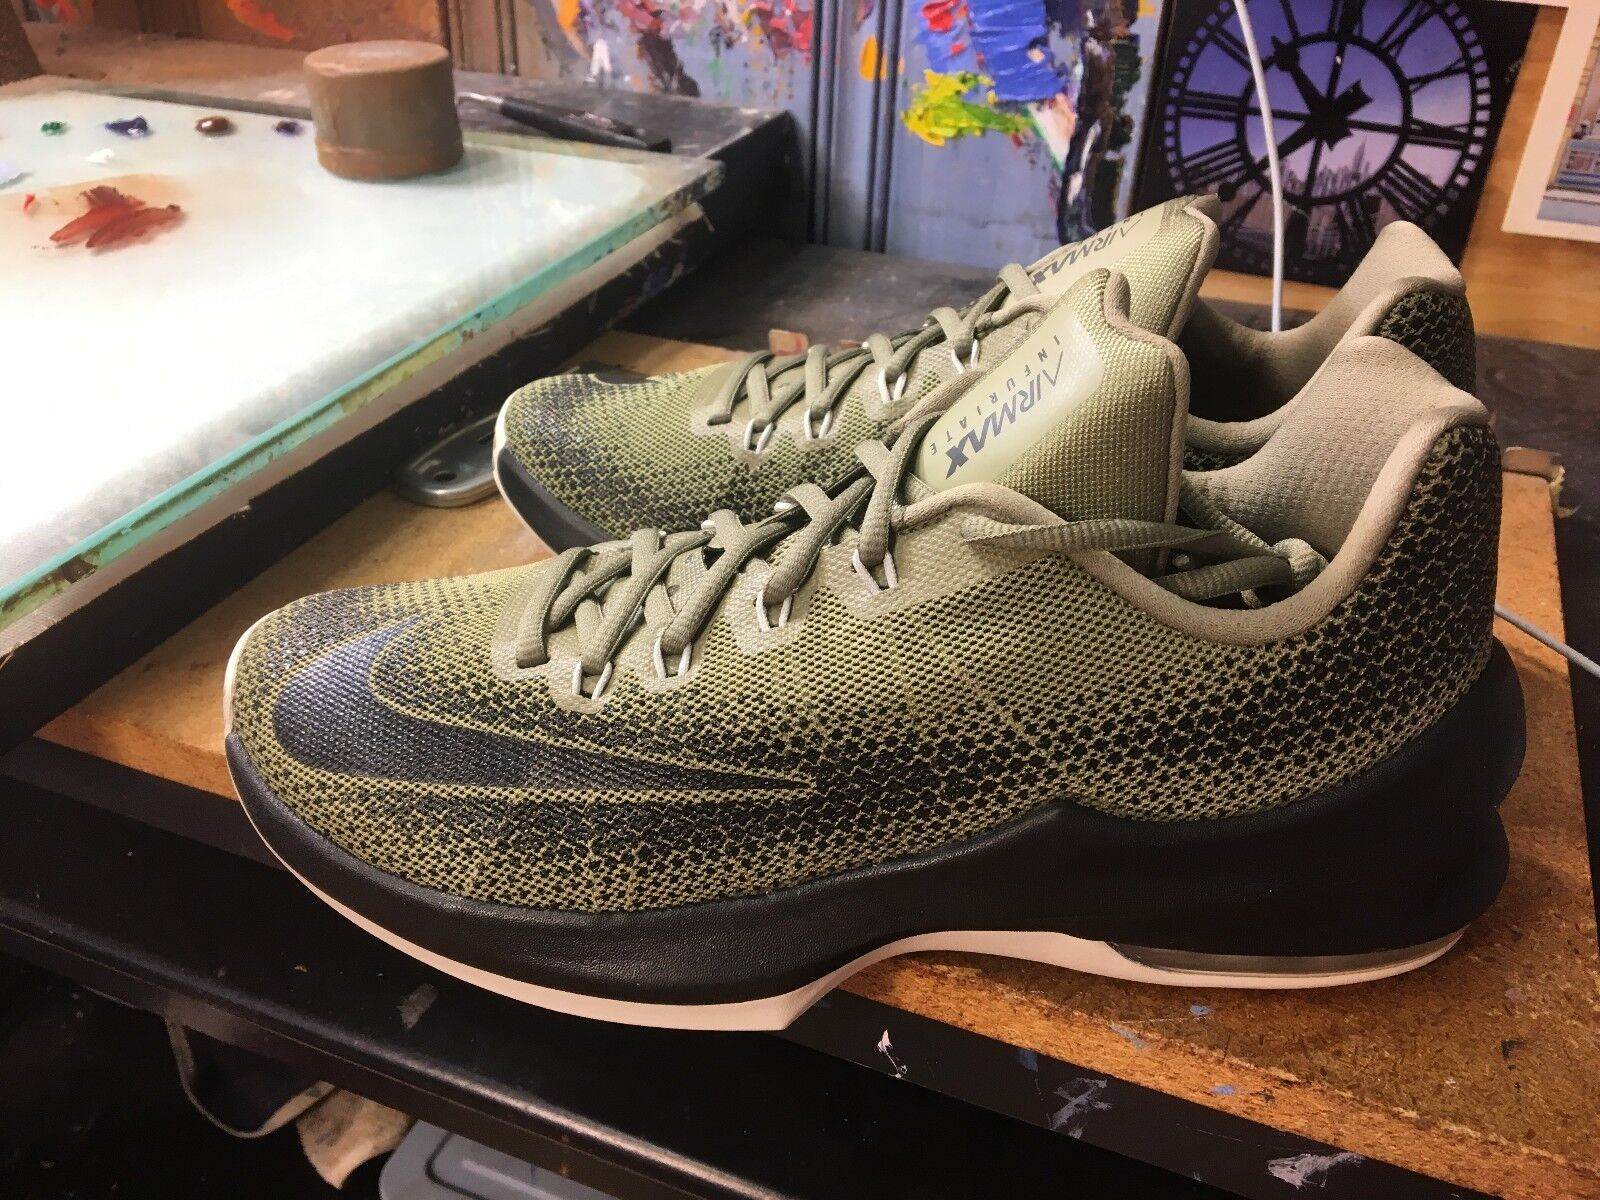 Nike Air Max Infuriate Low Trooper/Black-Cargo Khaki Size US 8.5 Men 852457 200